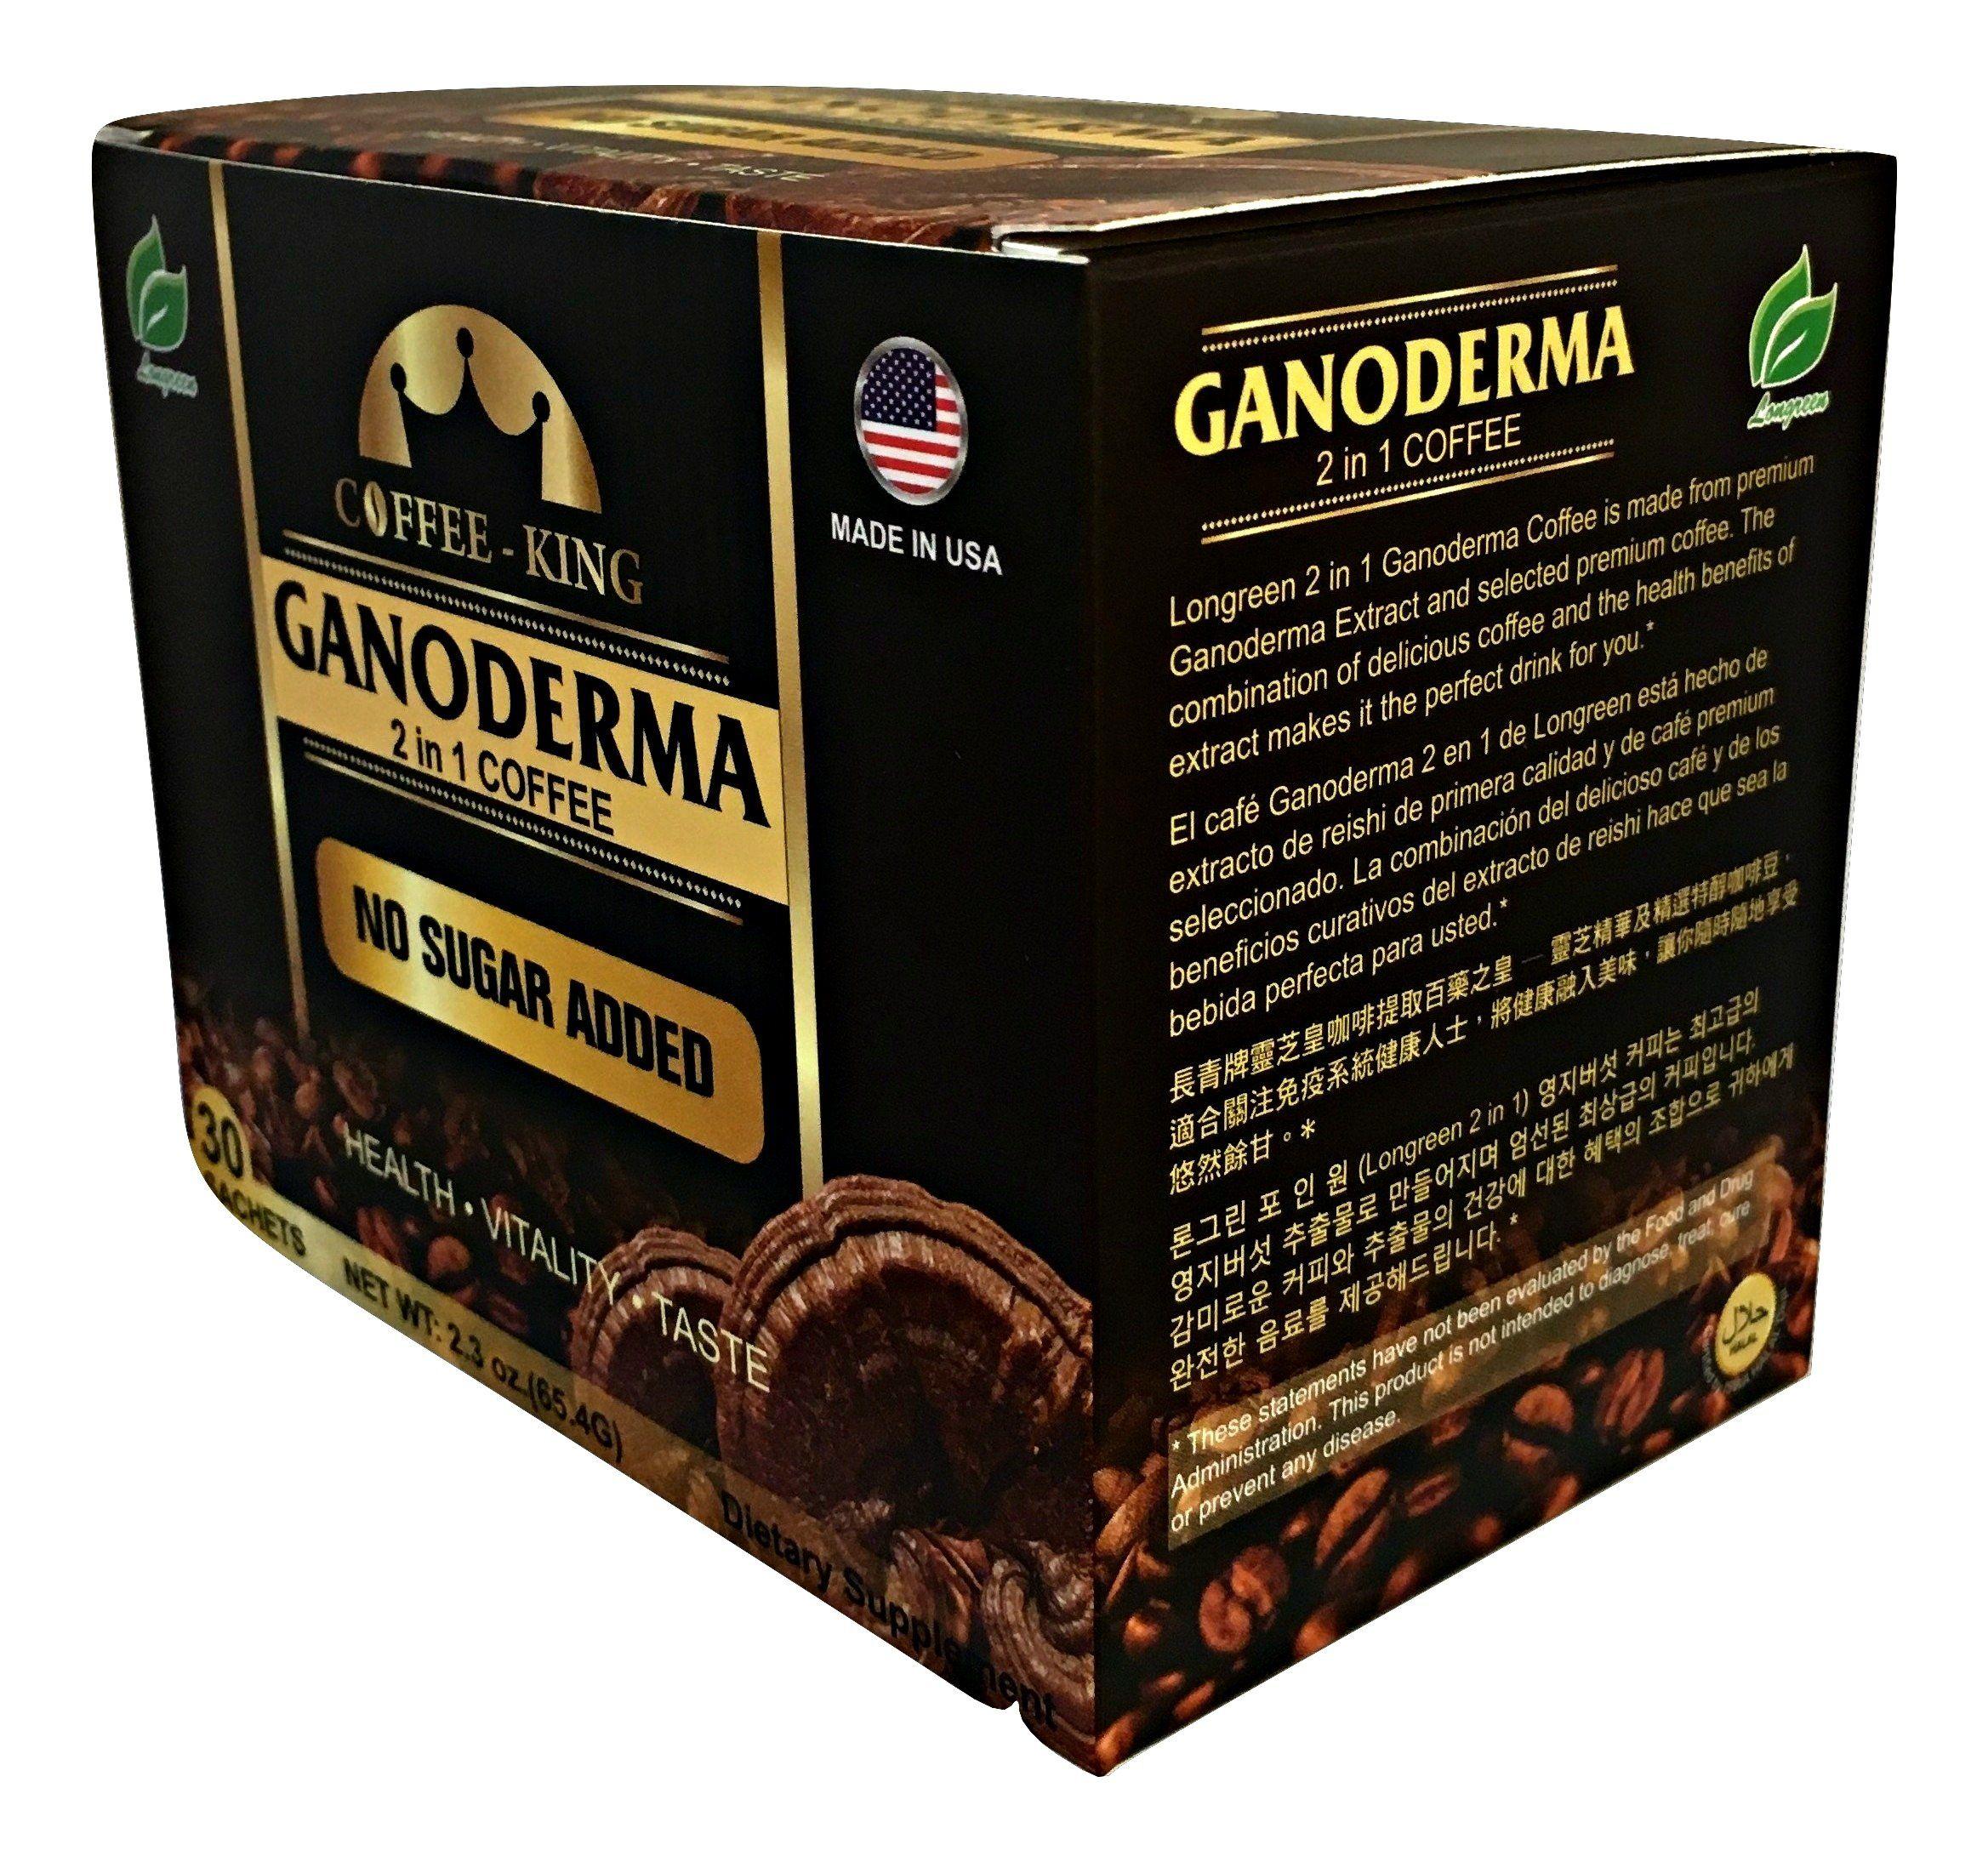 Ganoderma Coffee Reishi Coffee Mix Instant 2in1 Mushroom